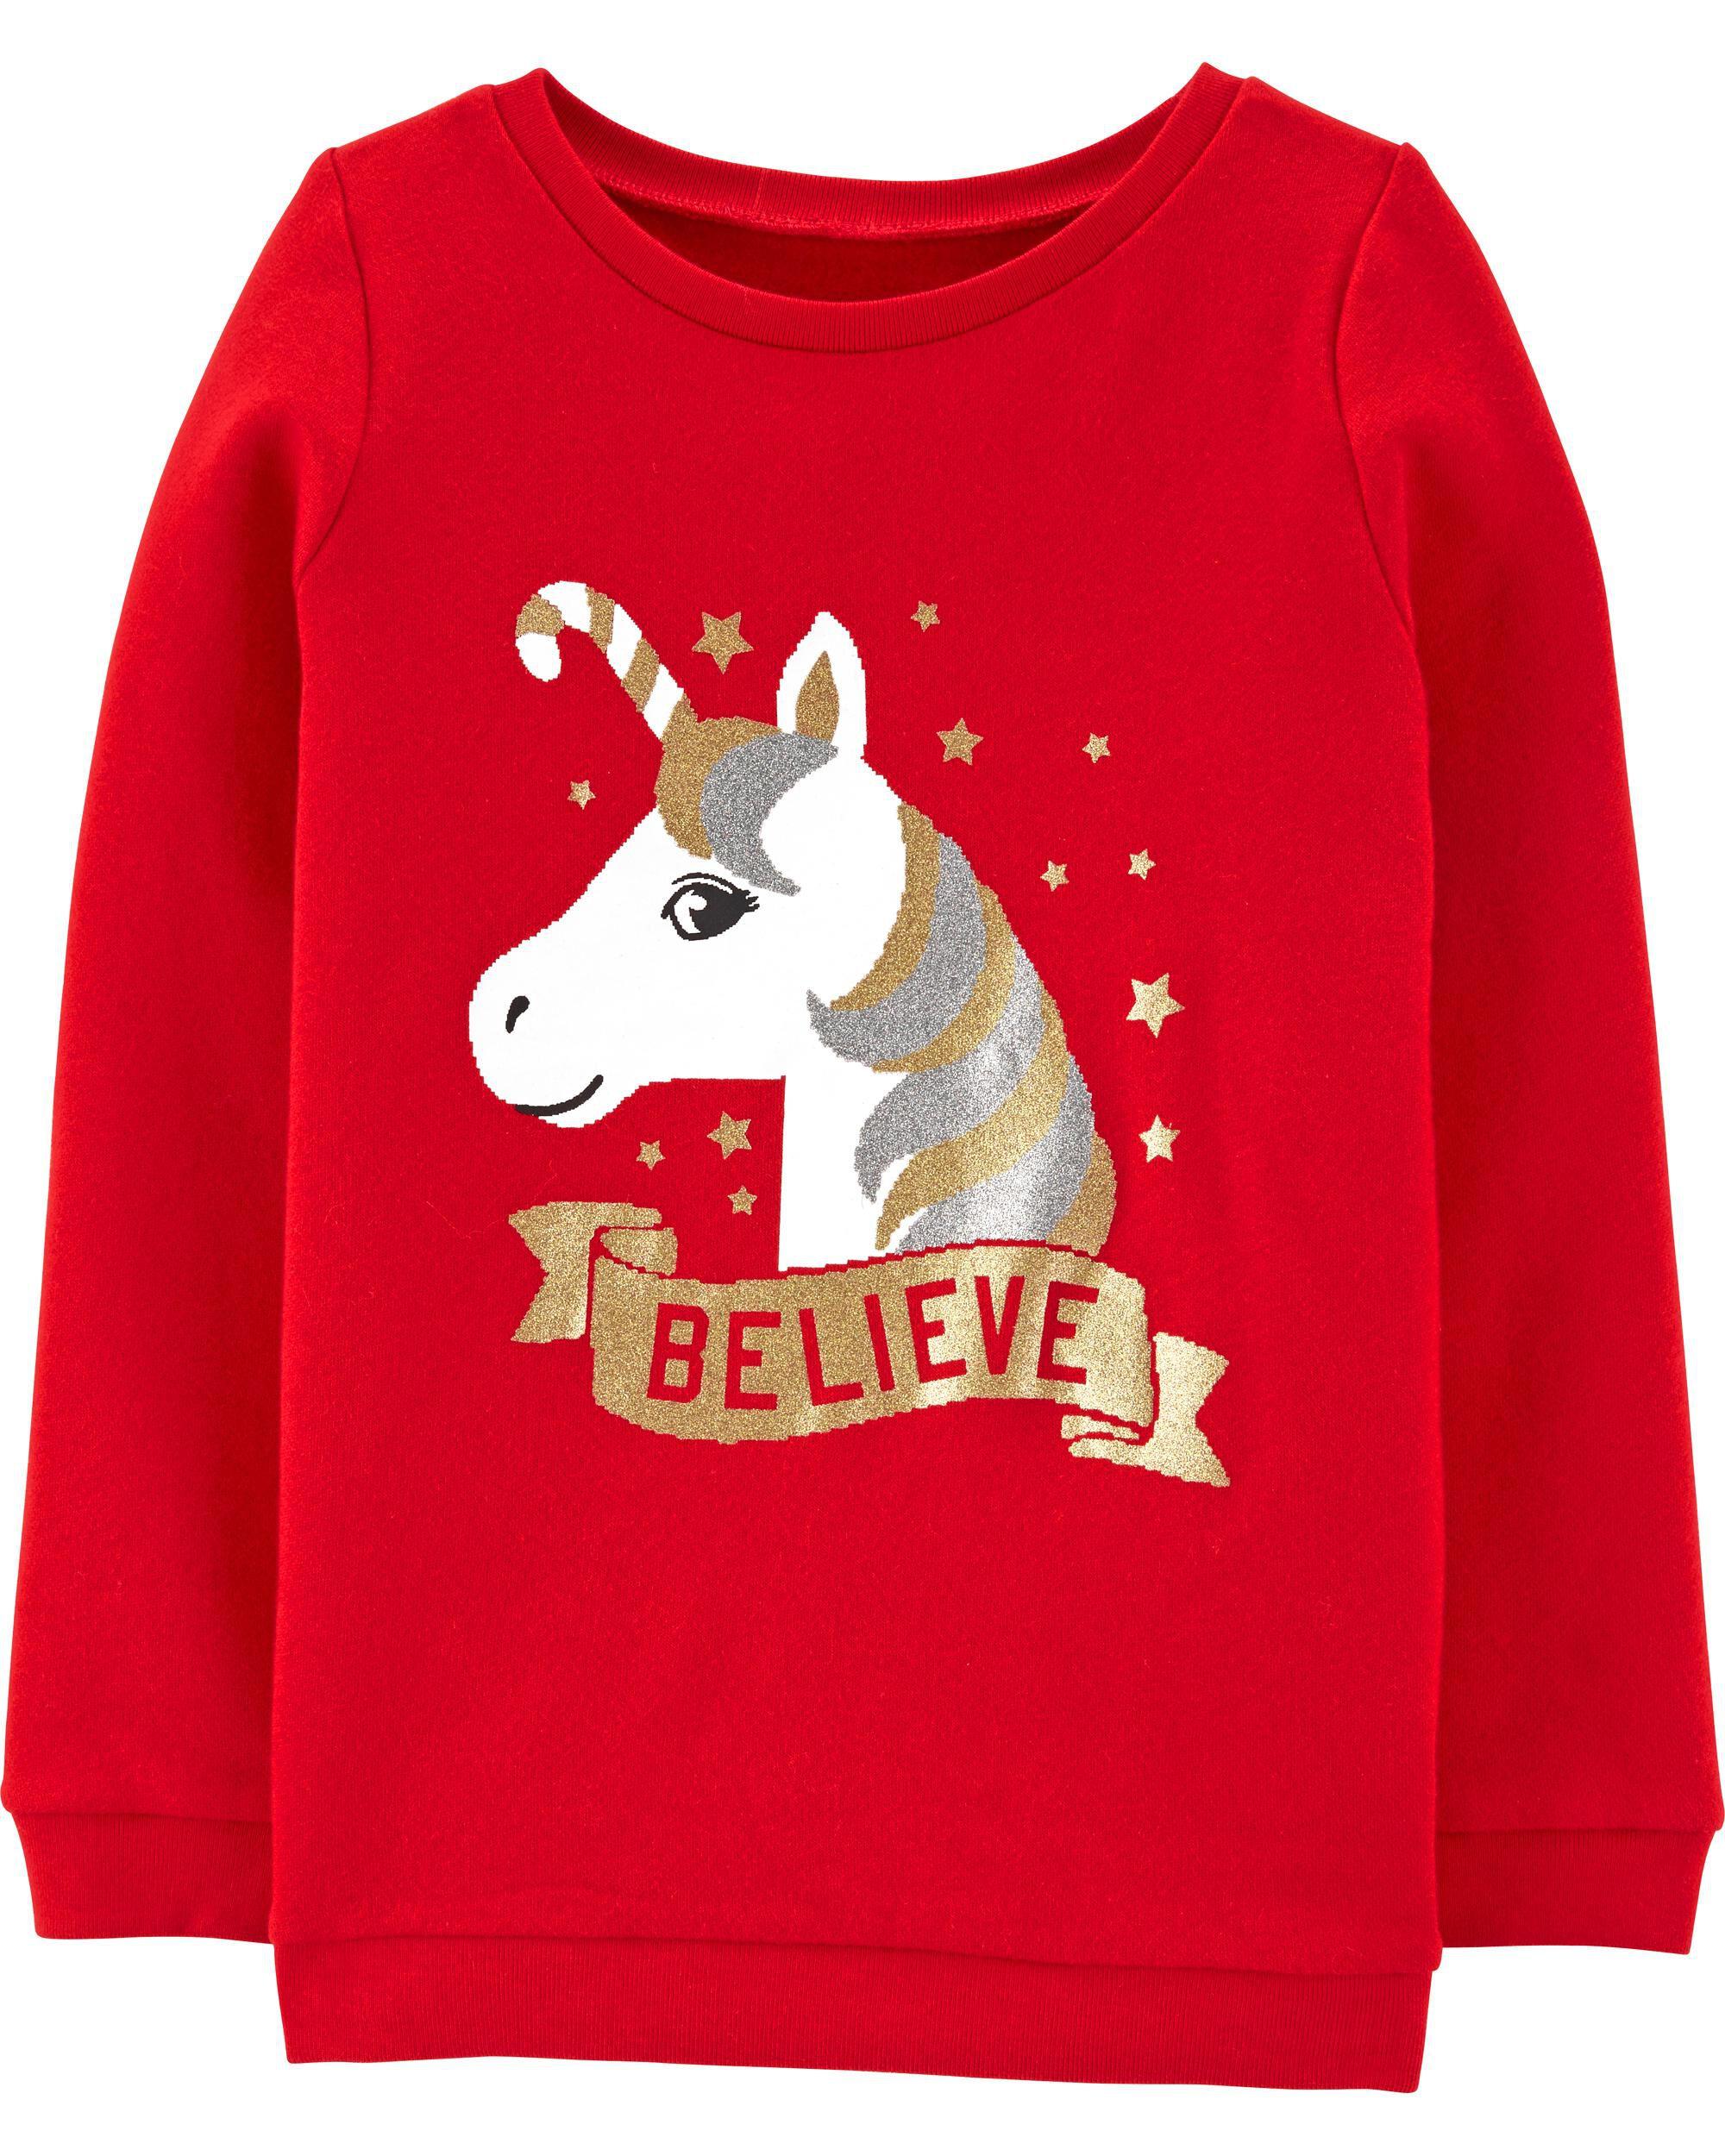 *DOORBUSTER* Unicorn Christmas Crew Neck Sweatshirt